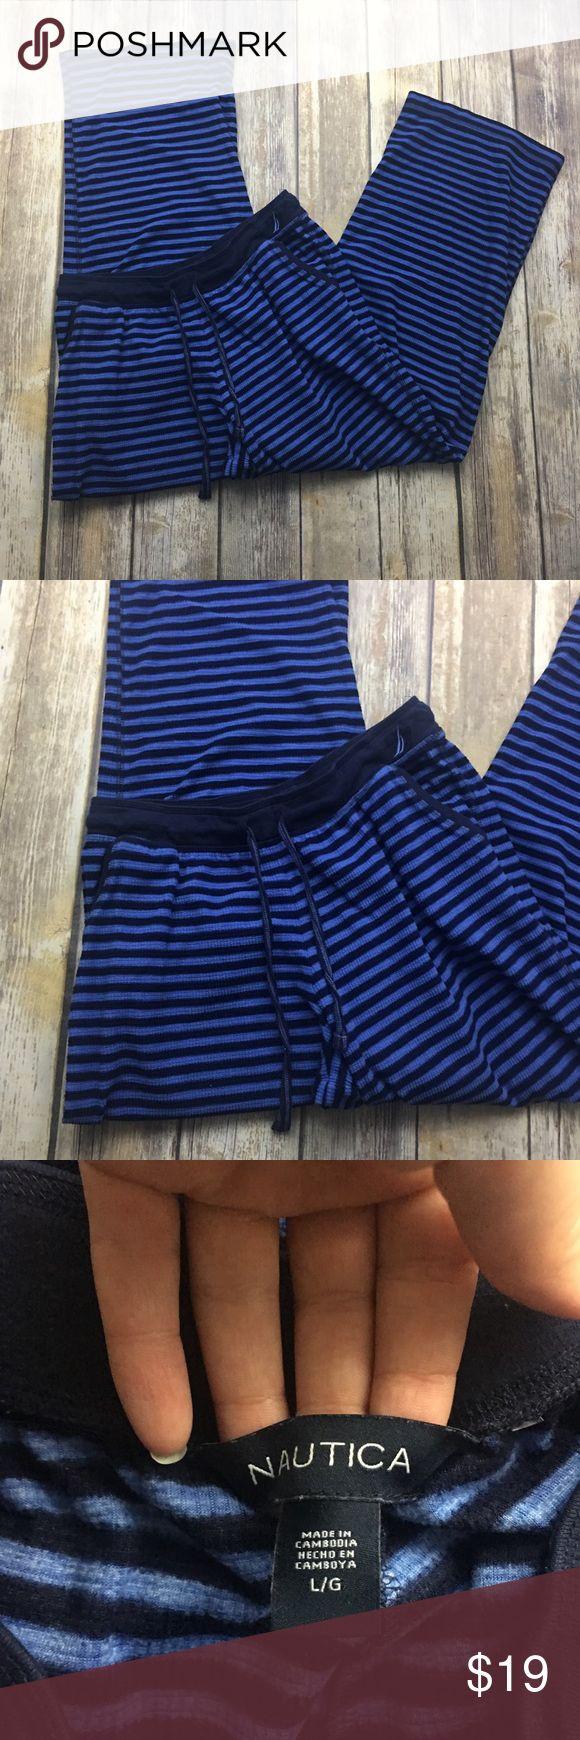 🎈 Nautica Blue Thermal Pajama Pants Size Large 🎈 Nautica Blue Thermal Pajama Pants Size Large. New without tags. 32 inch waist. 32 inch inseam. Elastic waistband. Only washed never worn. Nautica Intimates & Sleepwear Pajamas